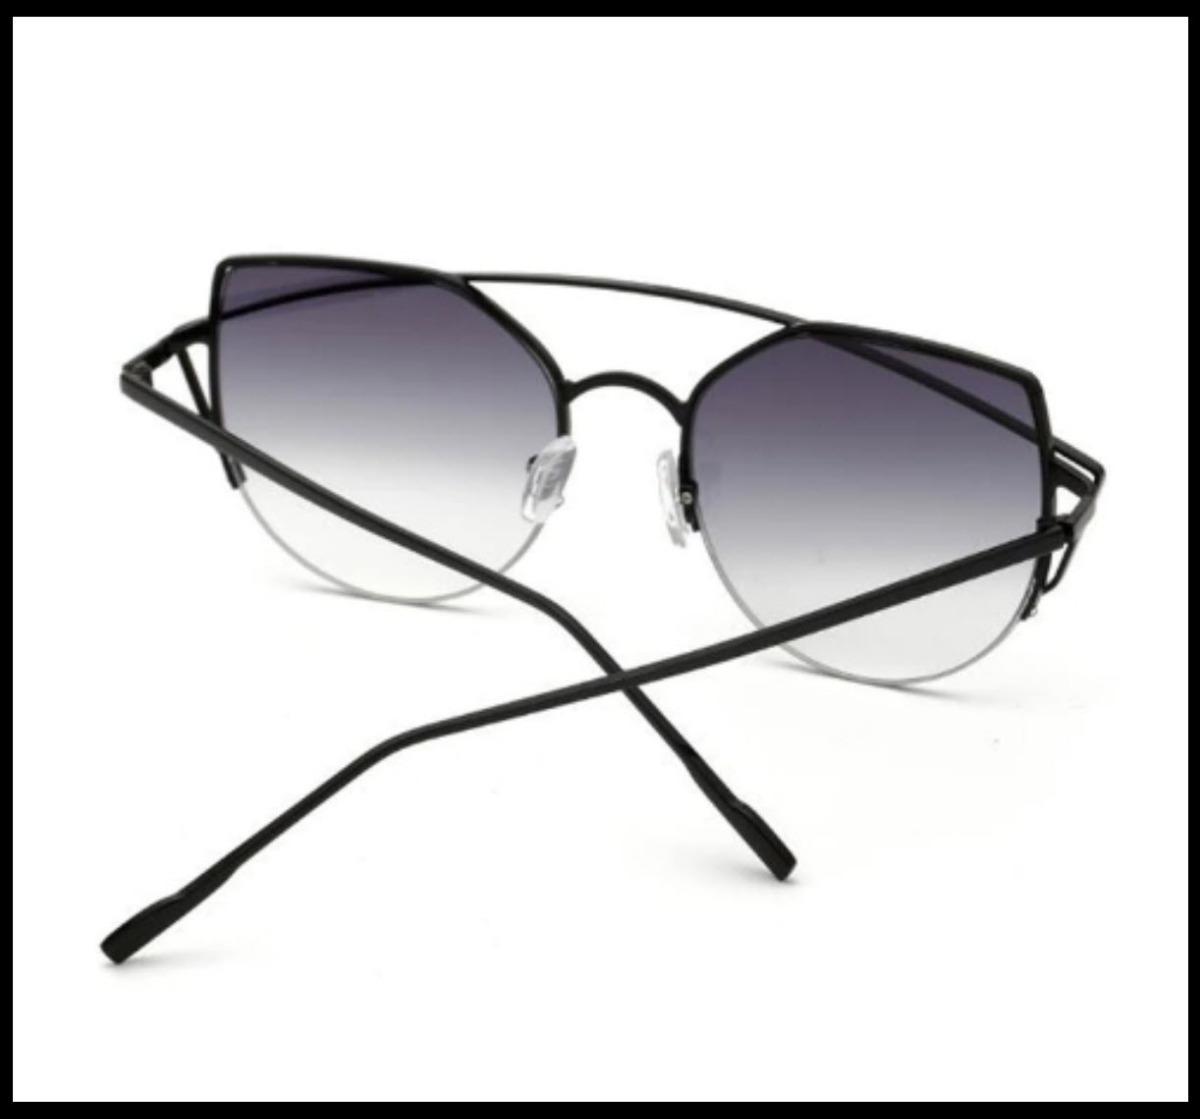 fe2ec42fa óculos de sol feminino vintage olho de gato espelho uv400. Carregando zoom.